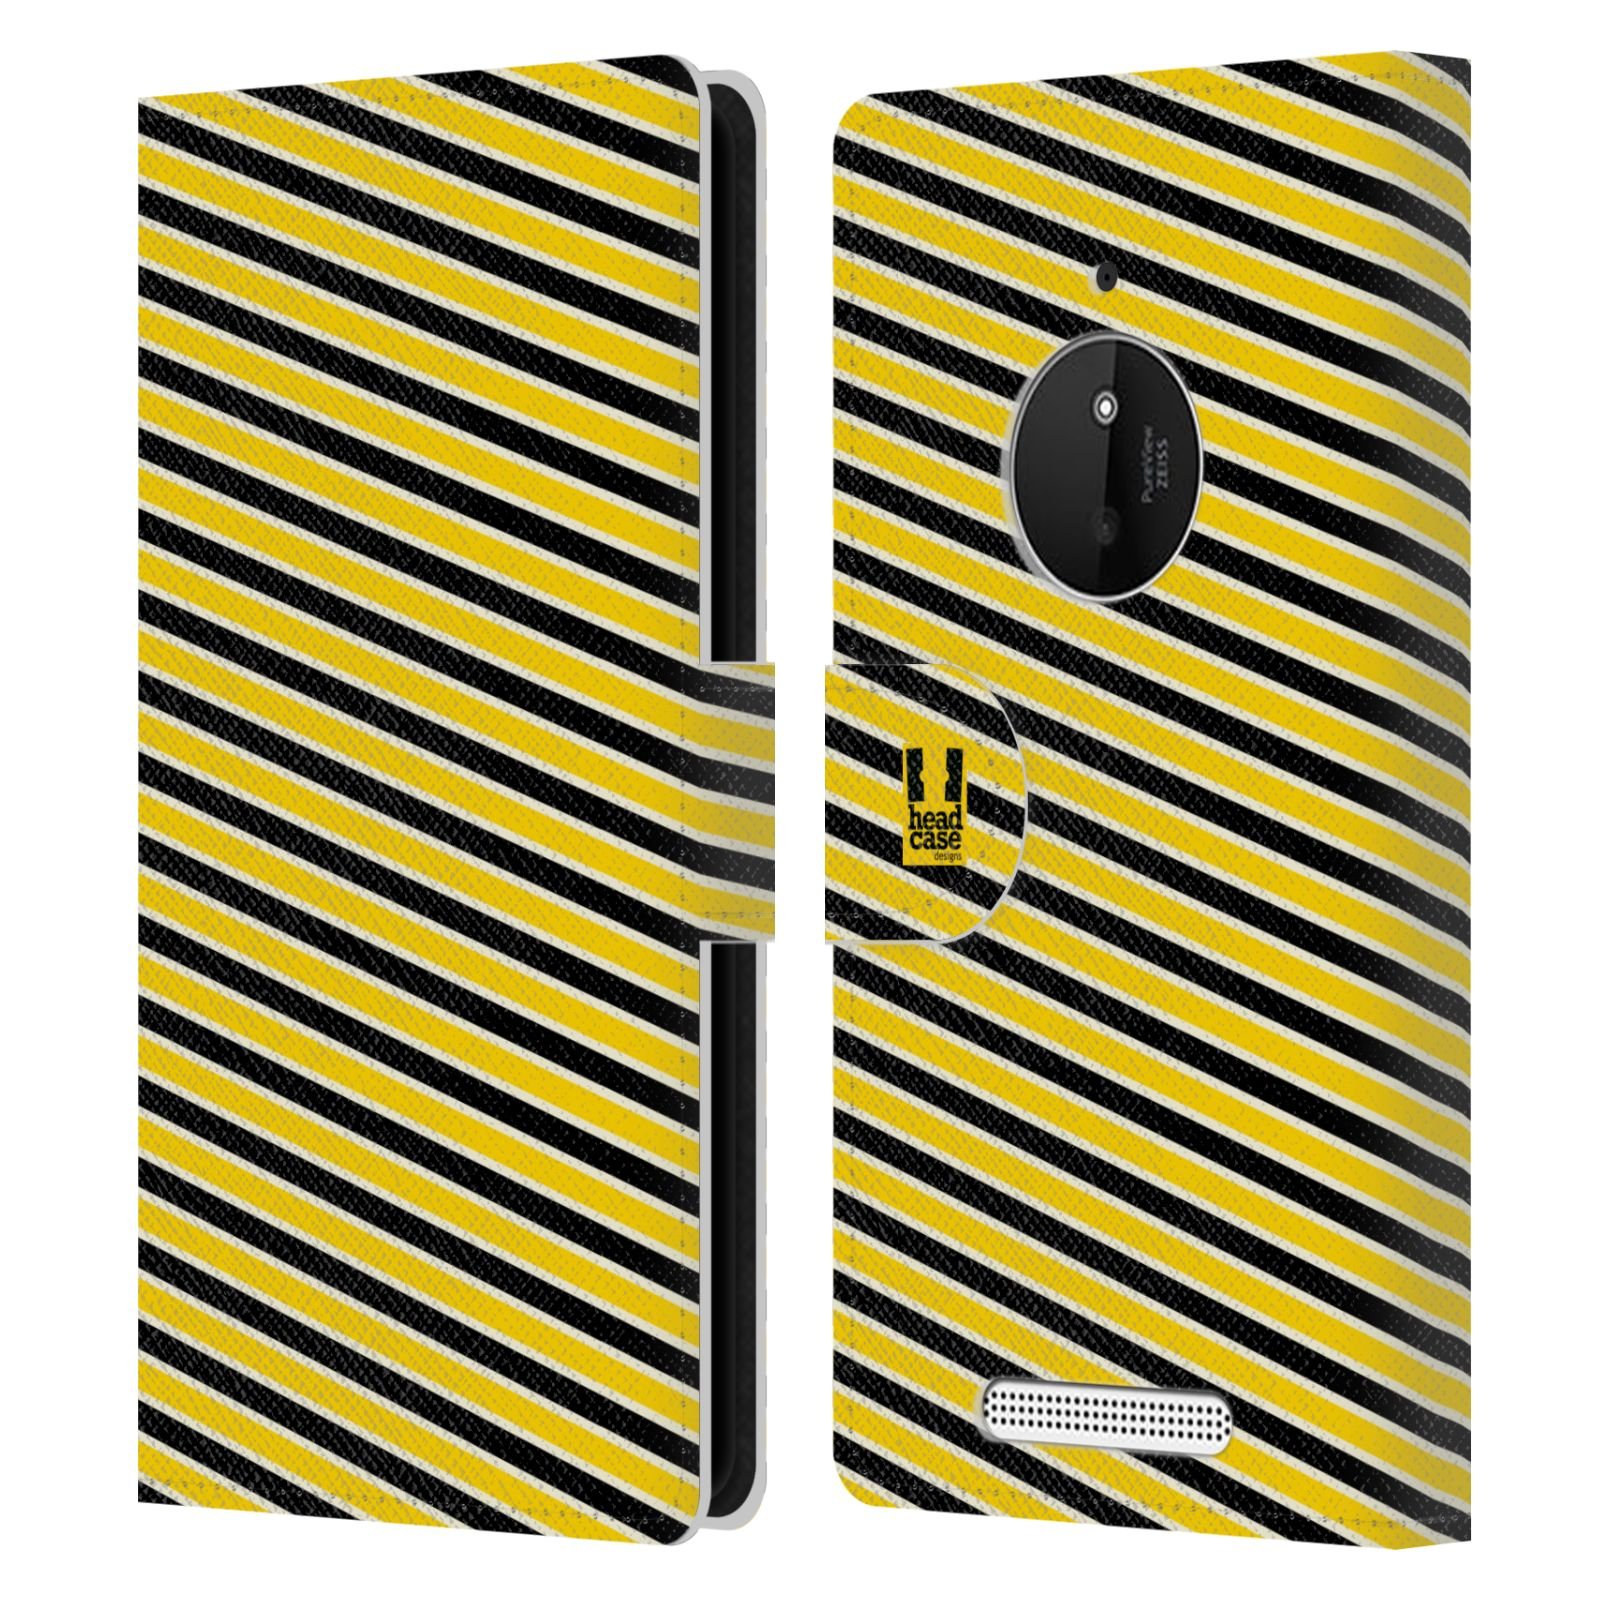 HEAD CASE Flipové pouzdro pro mobil NOKIA LUMIA 830 VČELÍ VZOR pruhy žlutá a černá